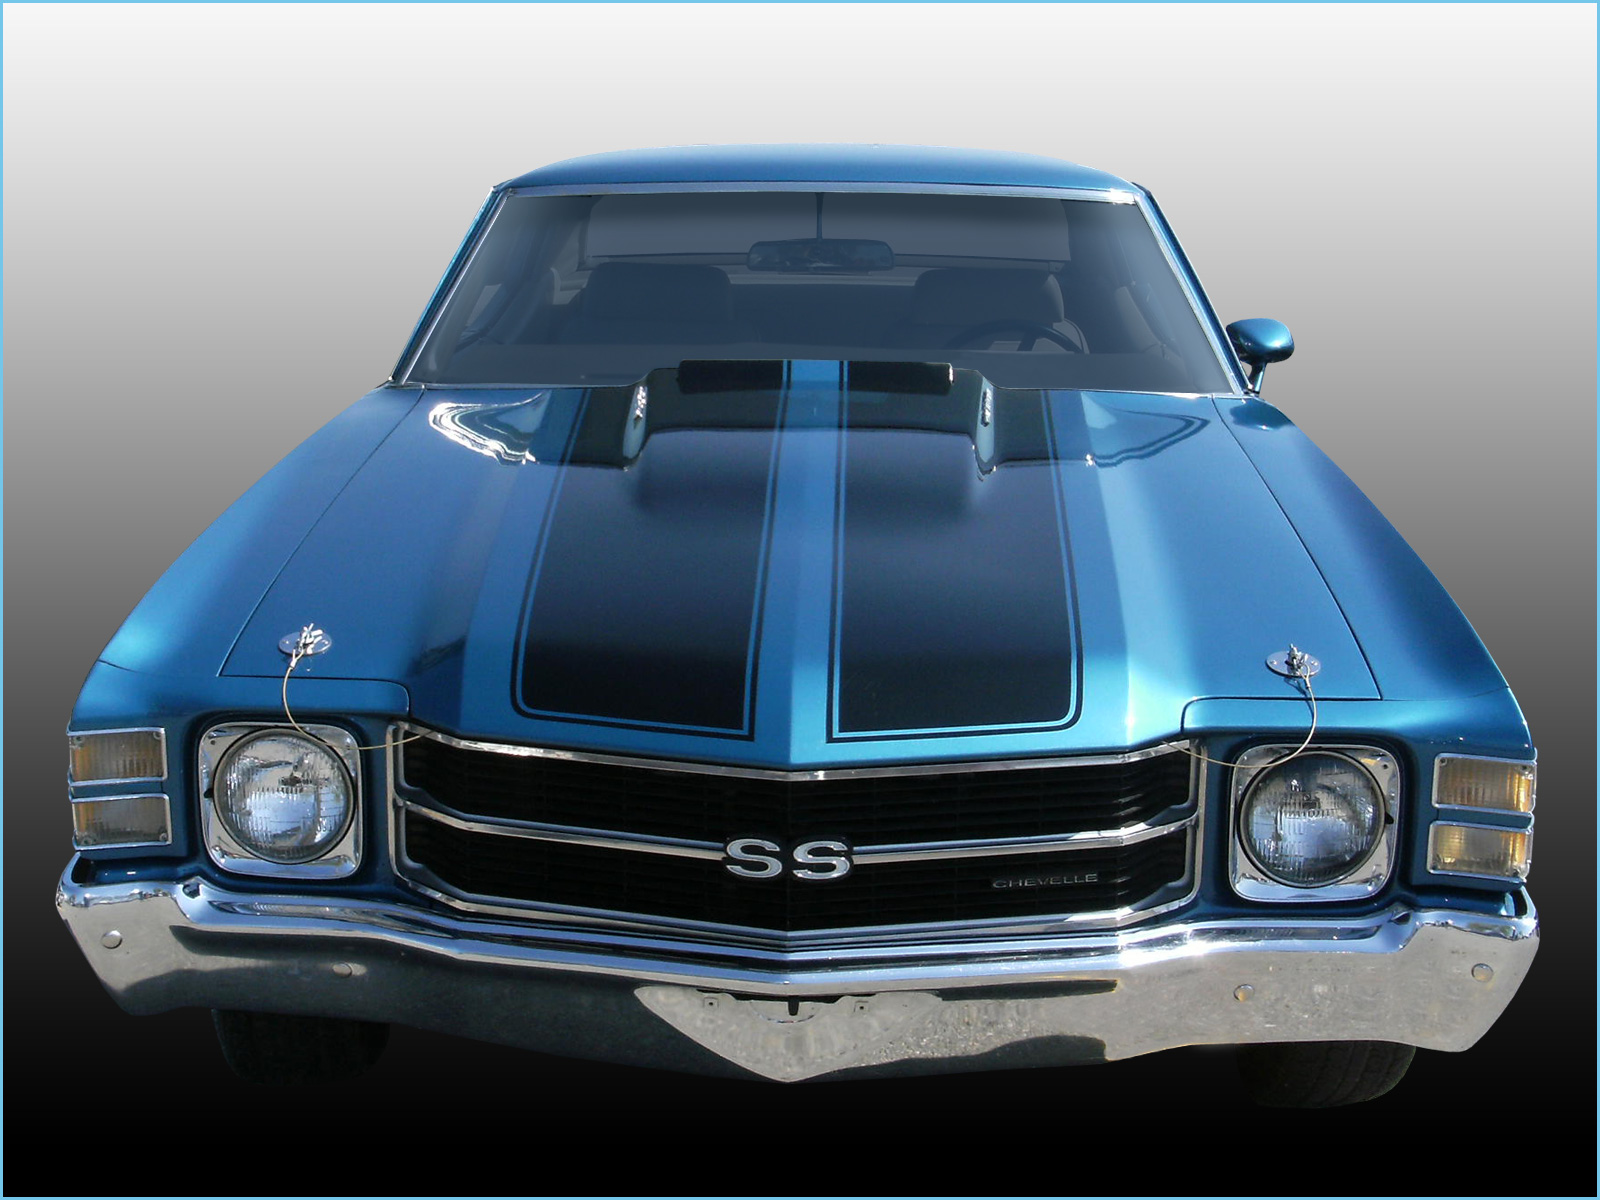 Chevelle SS Wallpaper 1971 Blue Hardtop 1600x1200 04 1600x1200